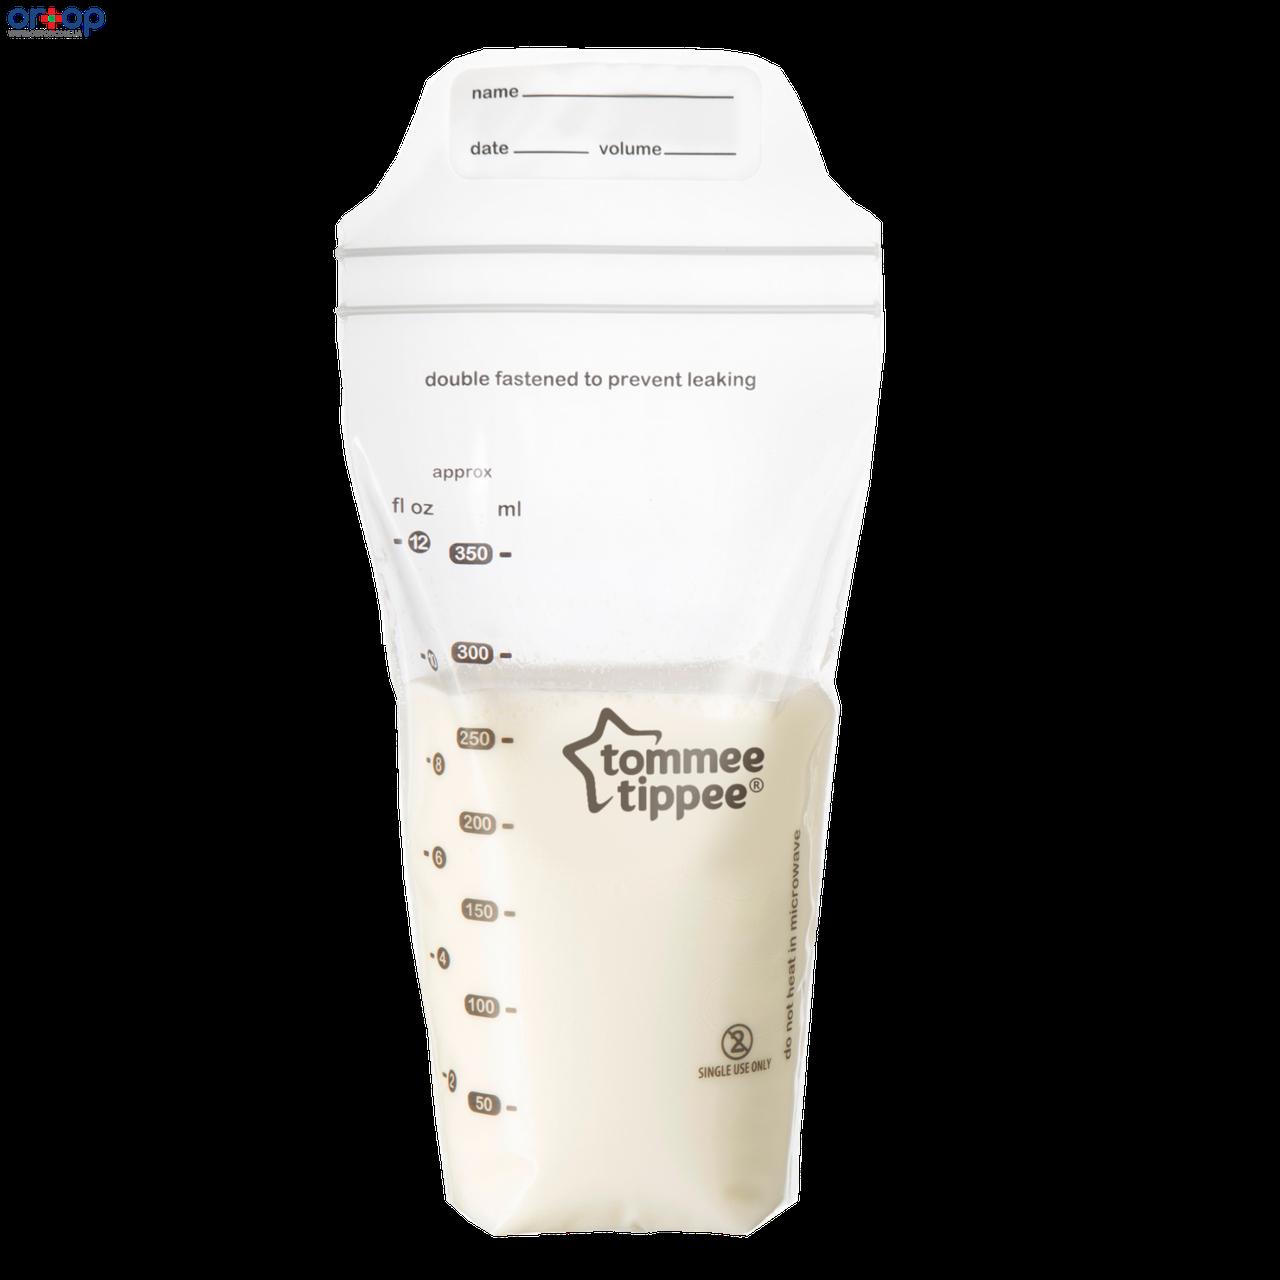 Пакеты для хранения грудного молока Tommee Tippee